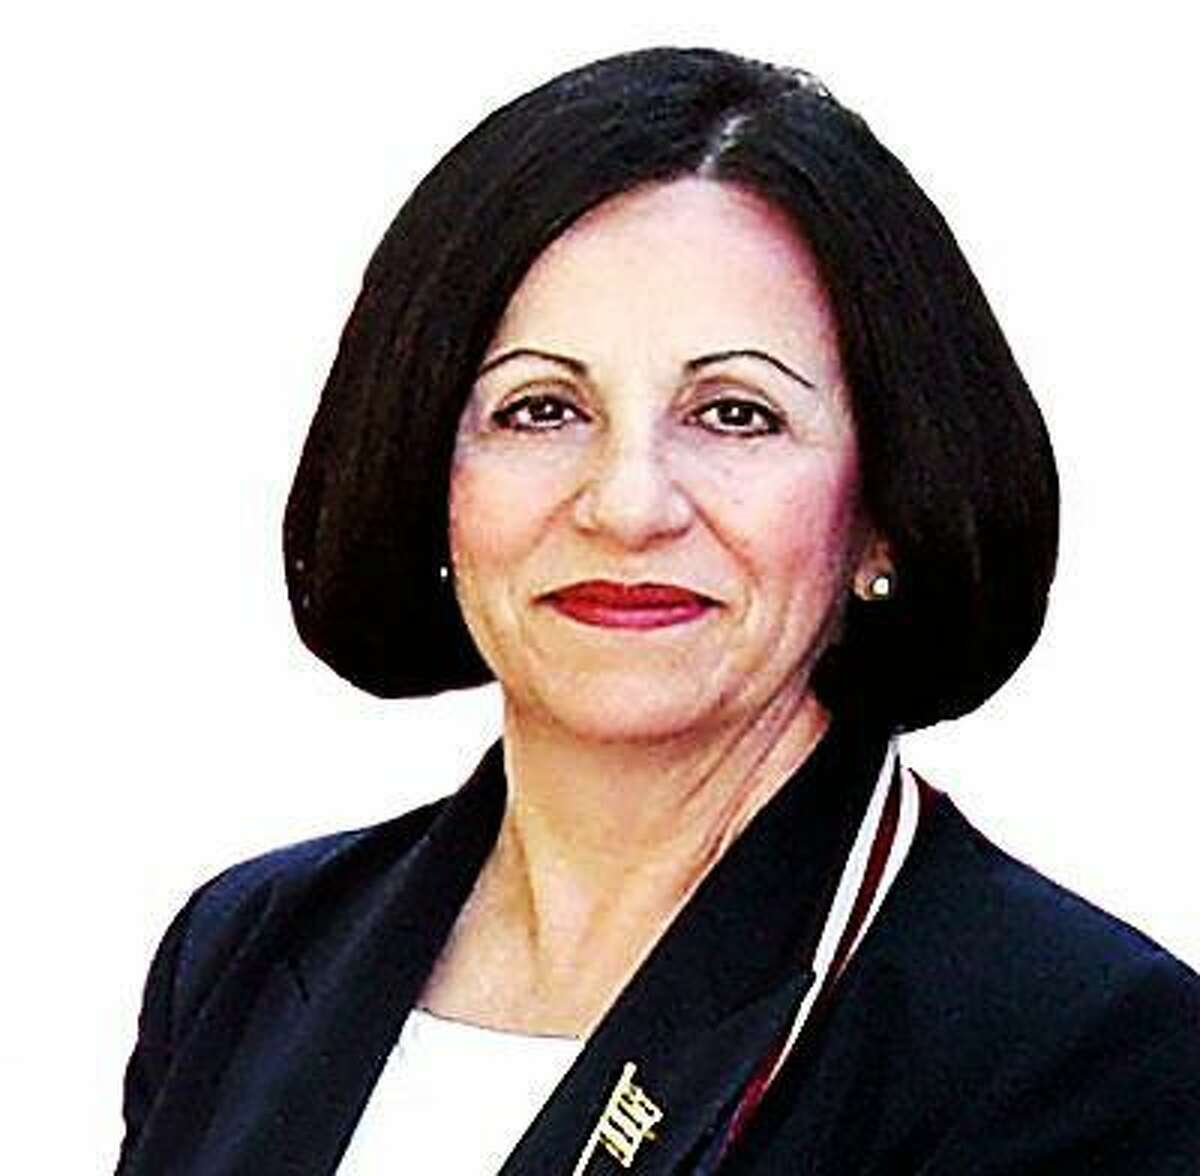 State Sen. Toni Boucher (Contributed photo)